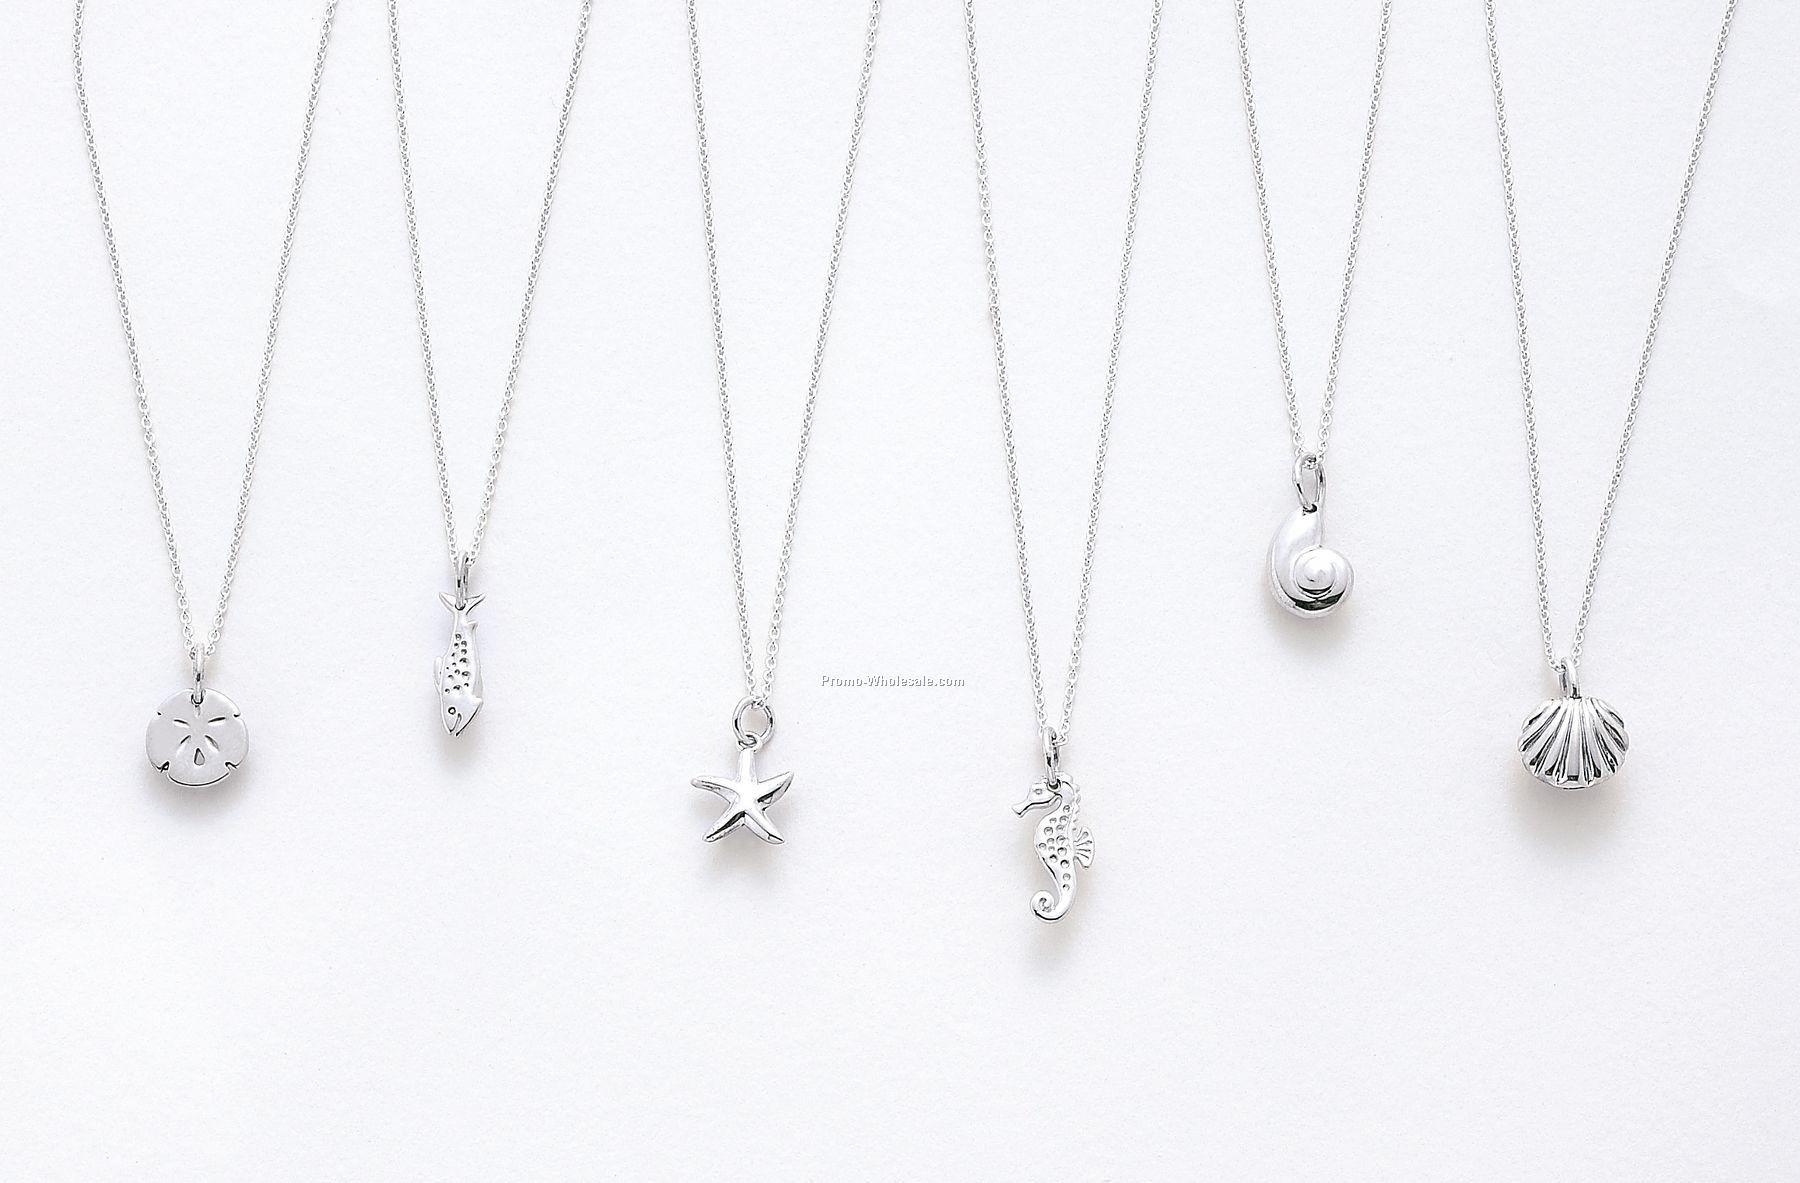 Pendantschina wholesale pendants plated silver sealife series pendant on cable chain w custom phrase logo aloadofball Image collections